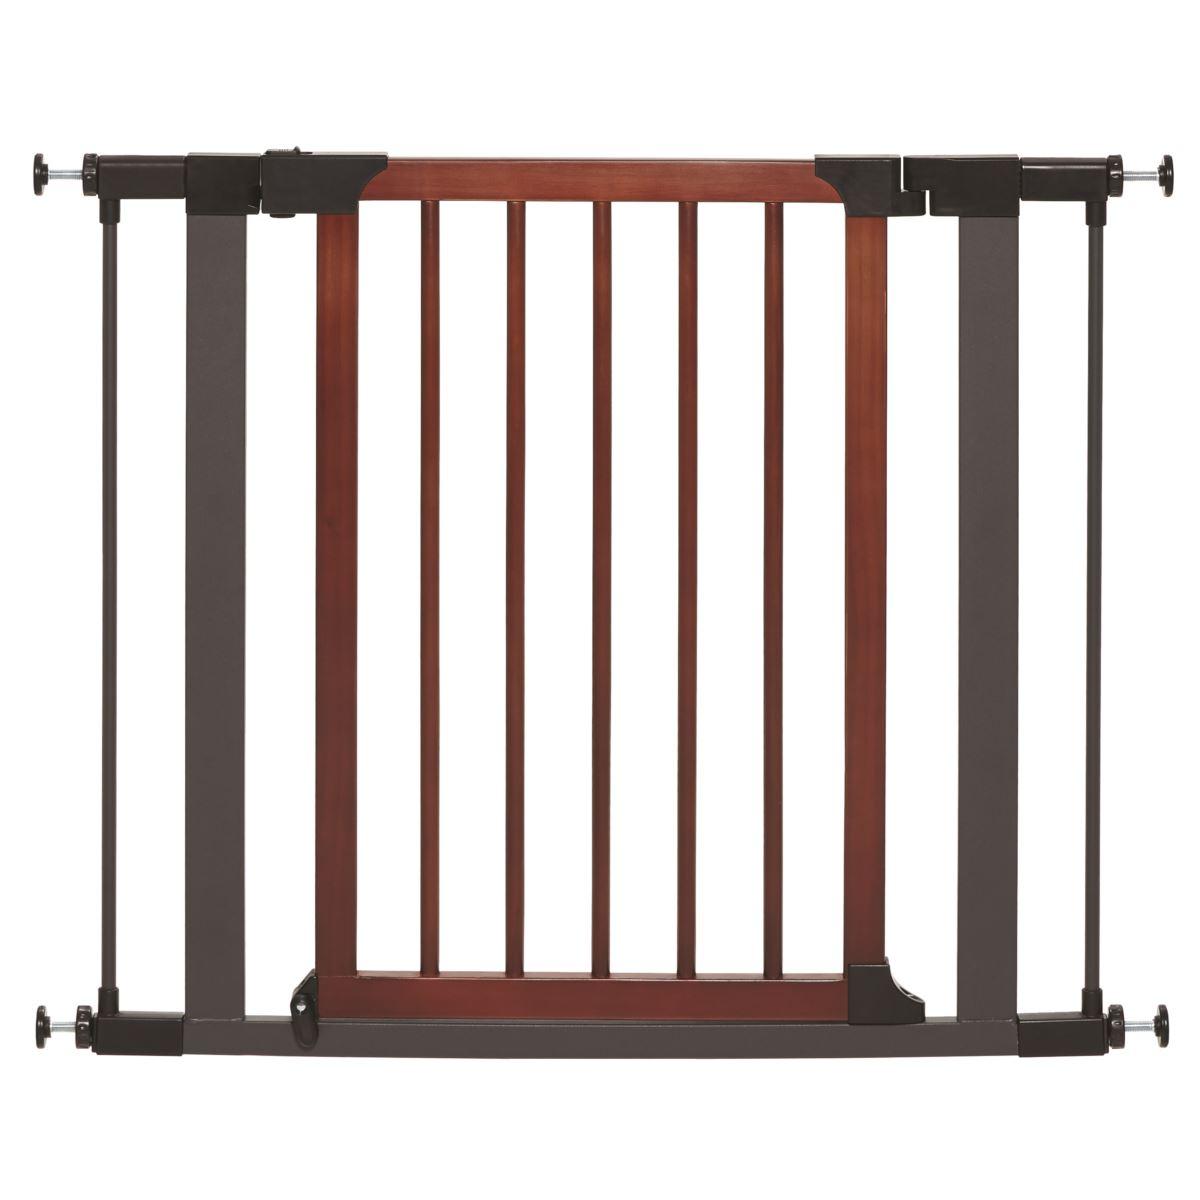 Midwest Steel Pet Gate with Decorative Wood Door, 29-in